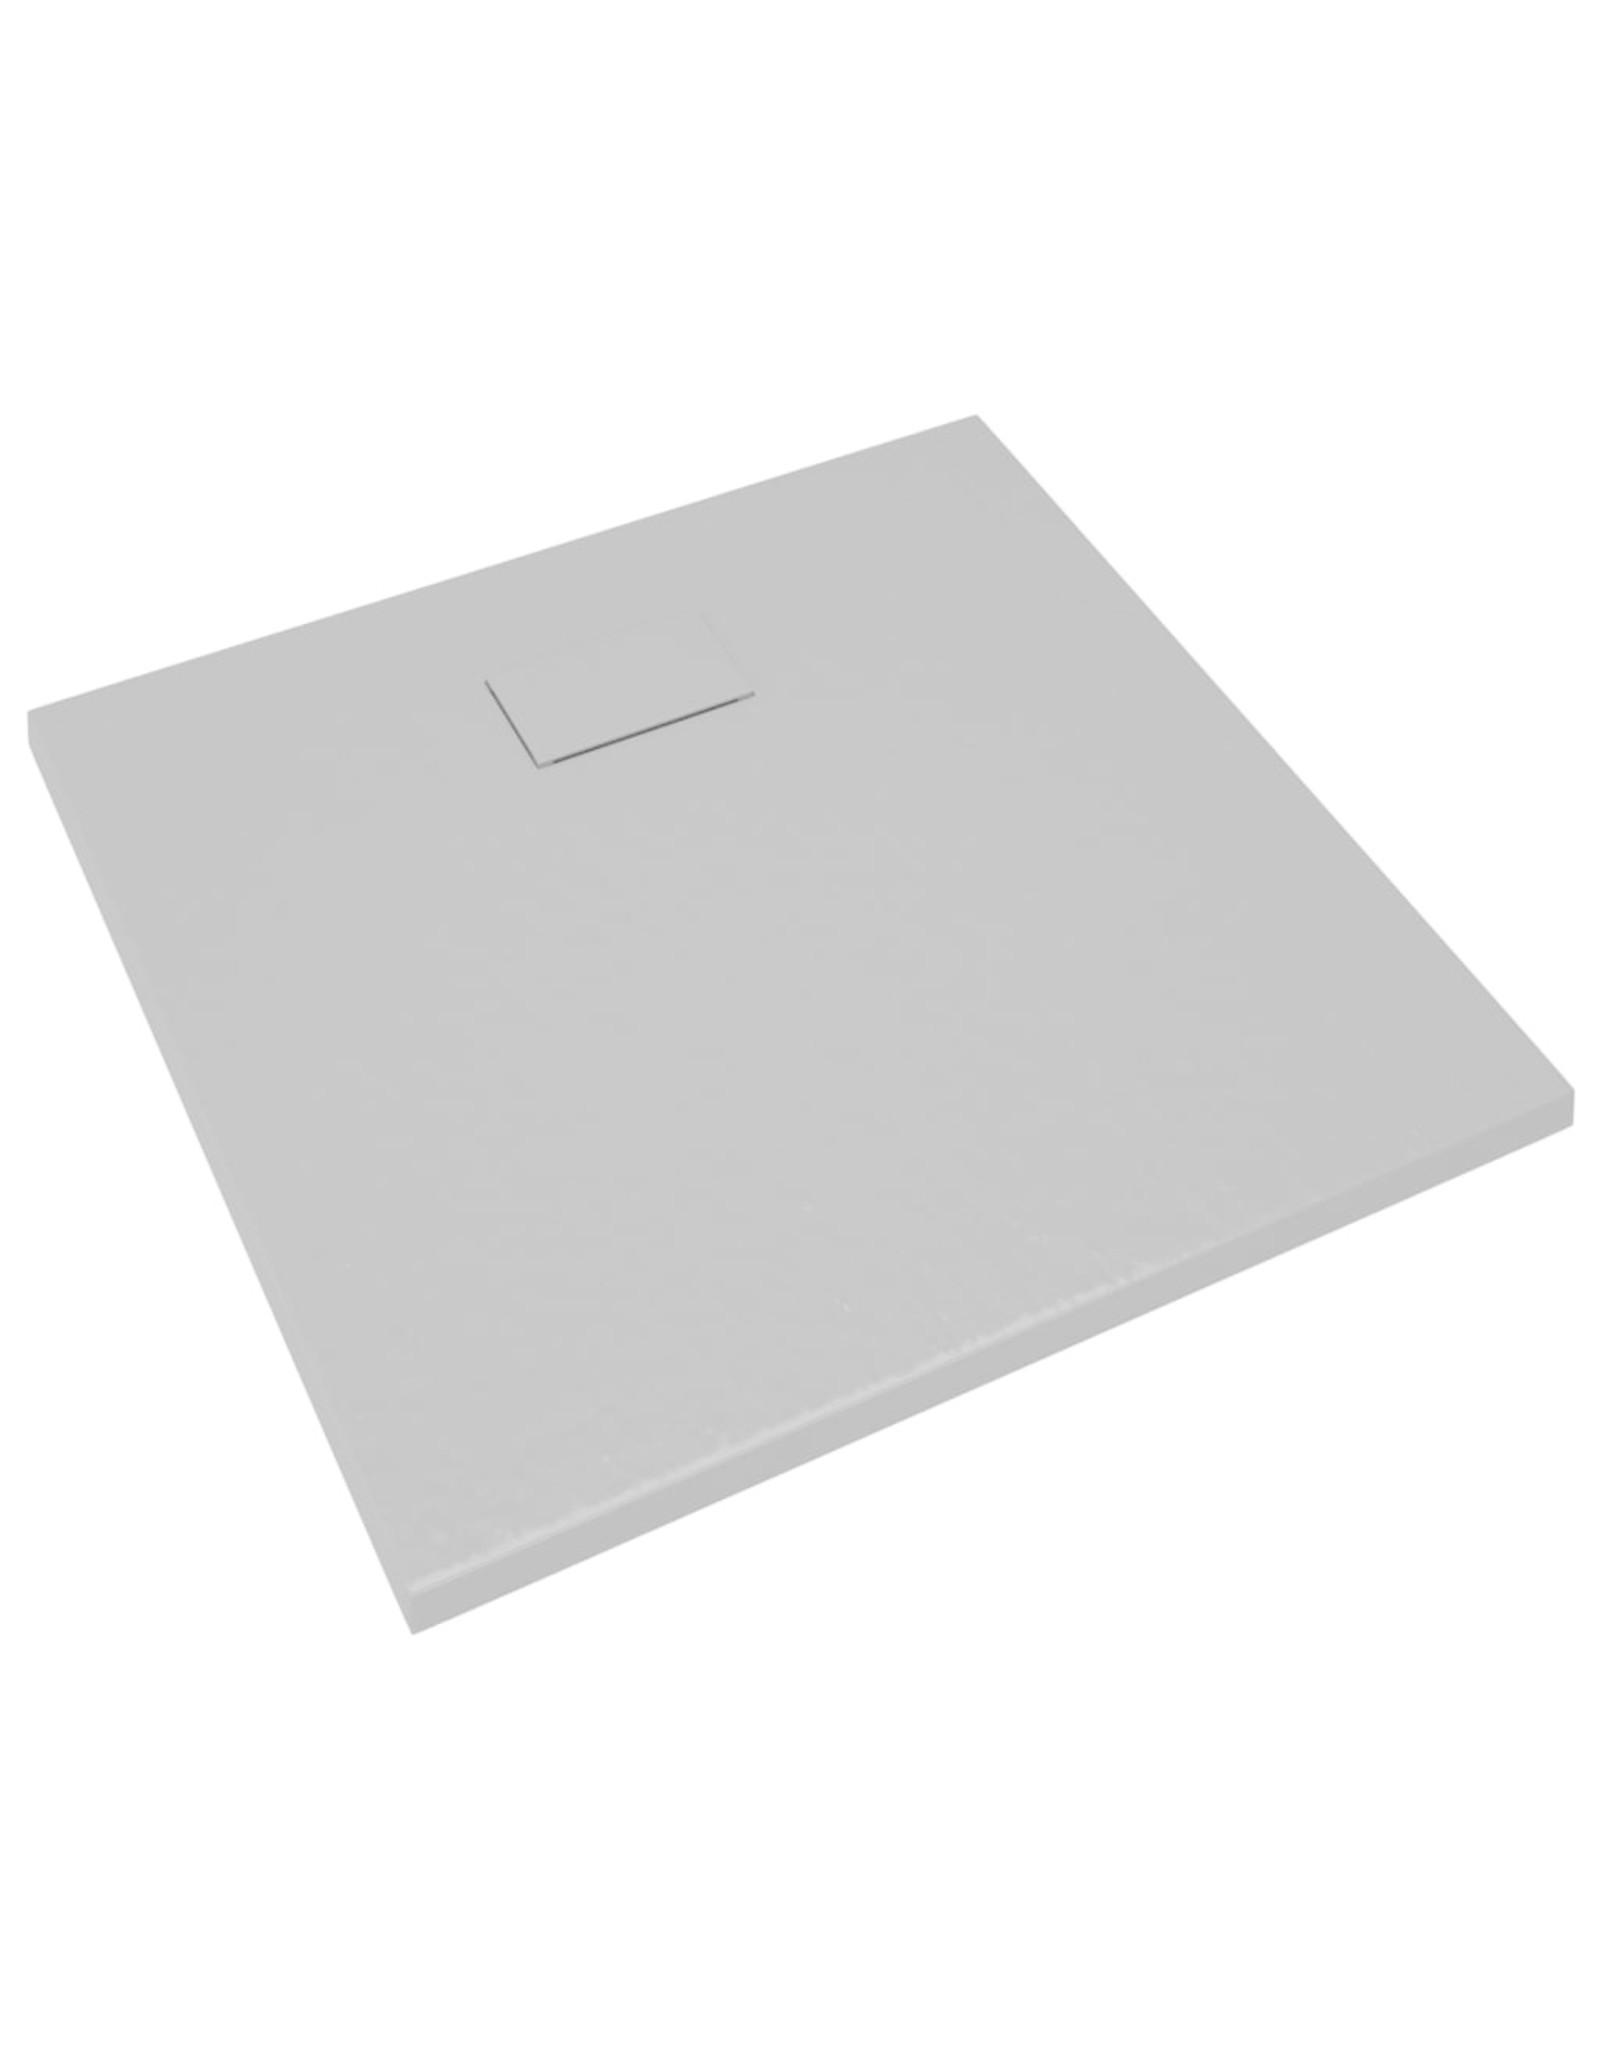 Douchebak 90x80 cm SMC grijs